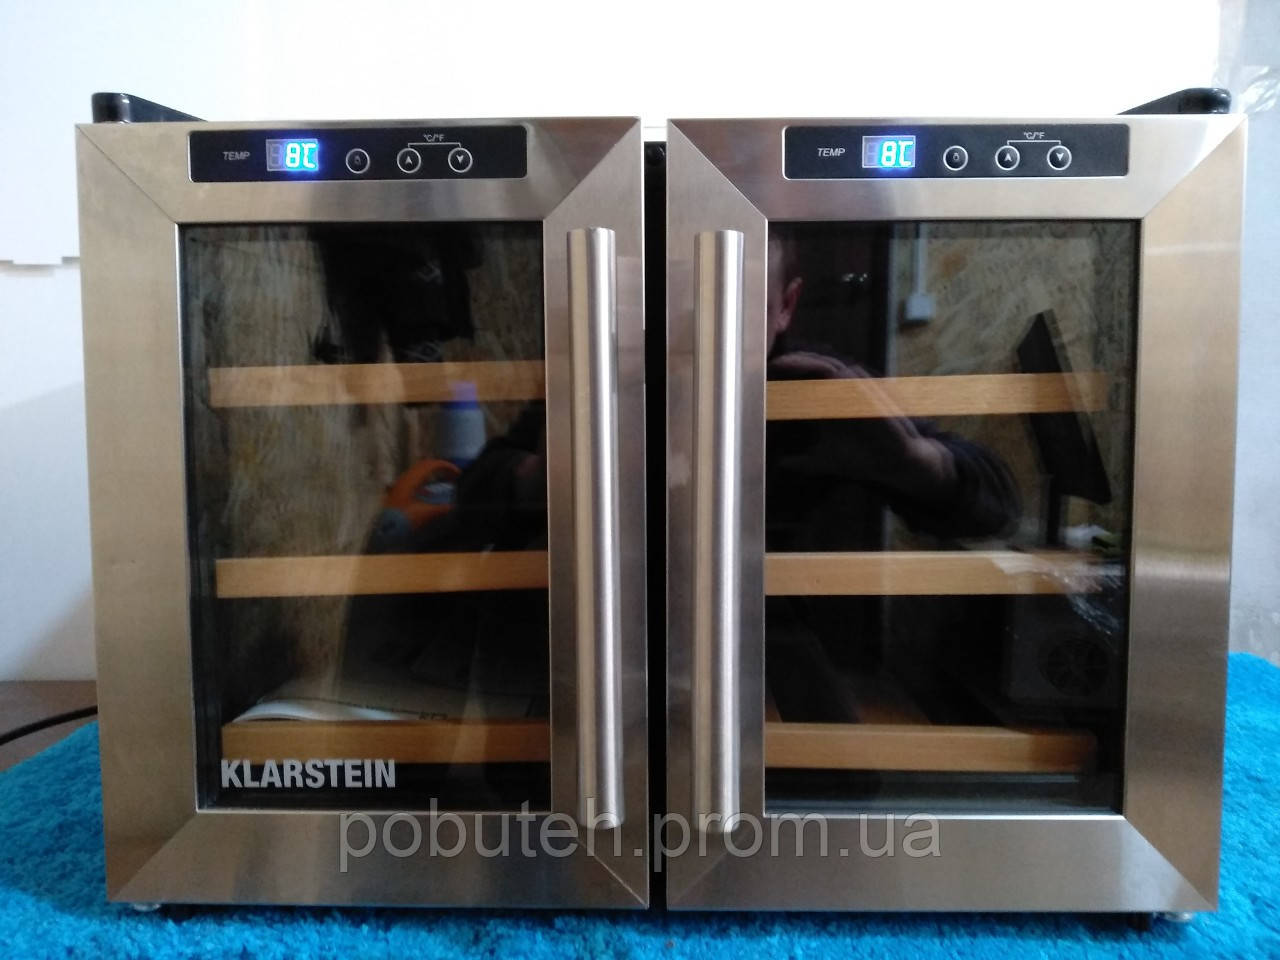 Винный шкаф Klarstein 10028492